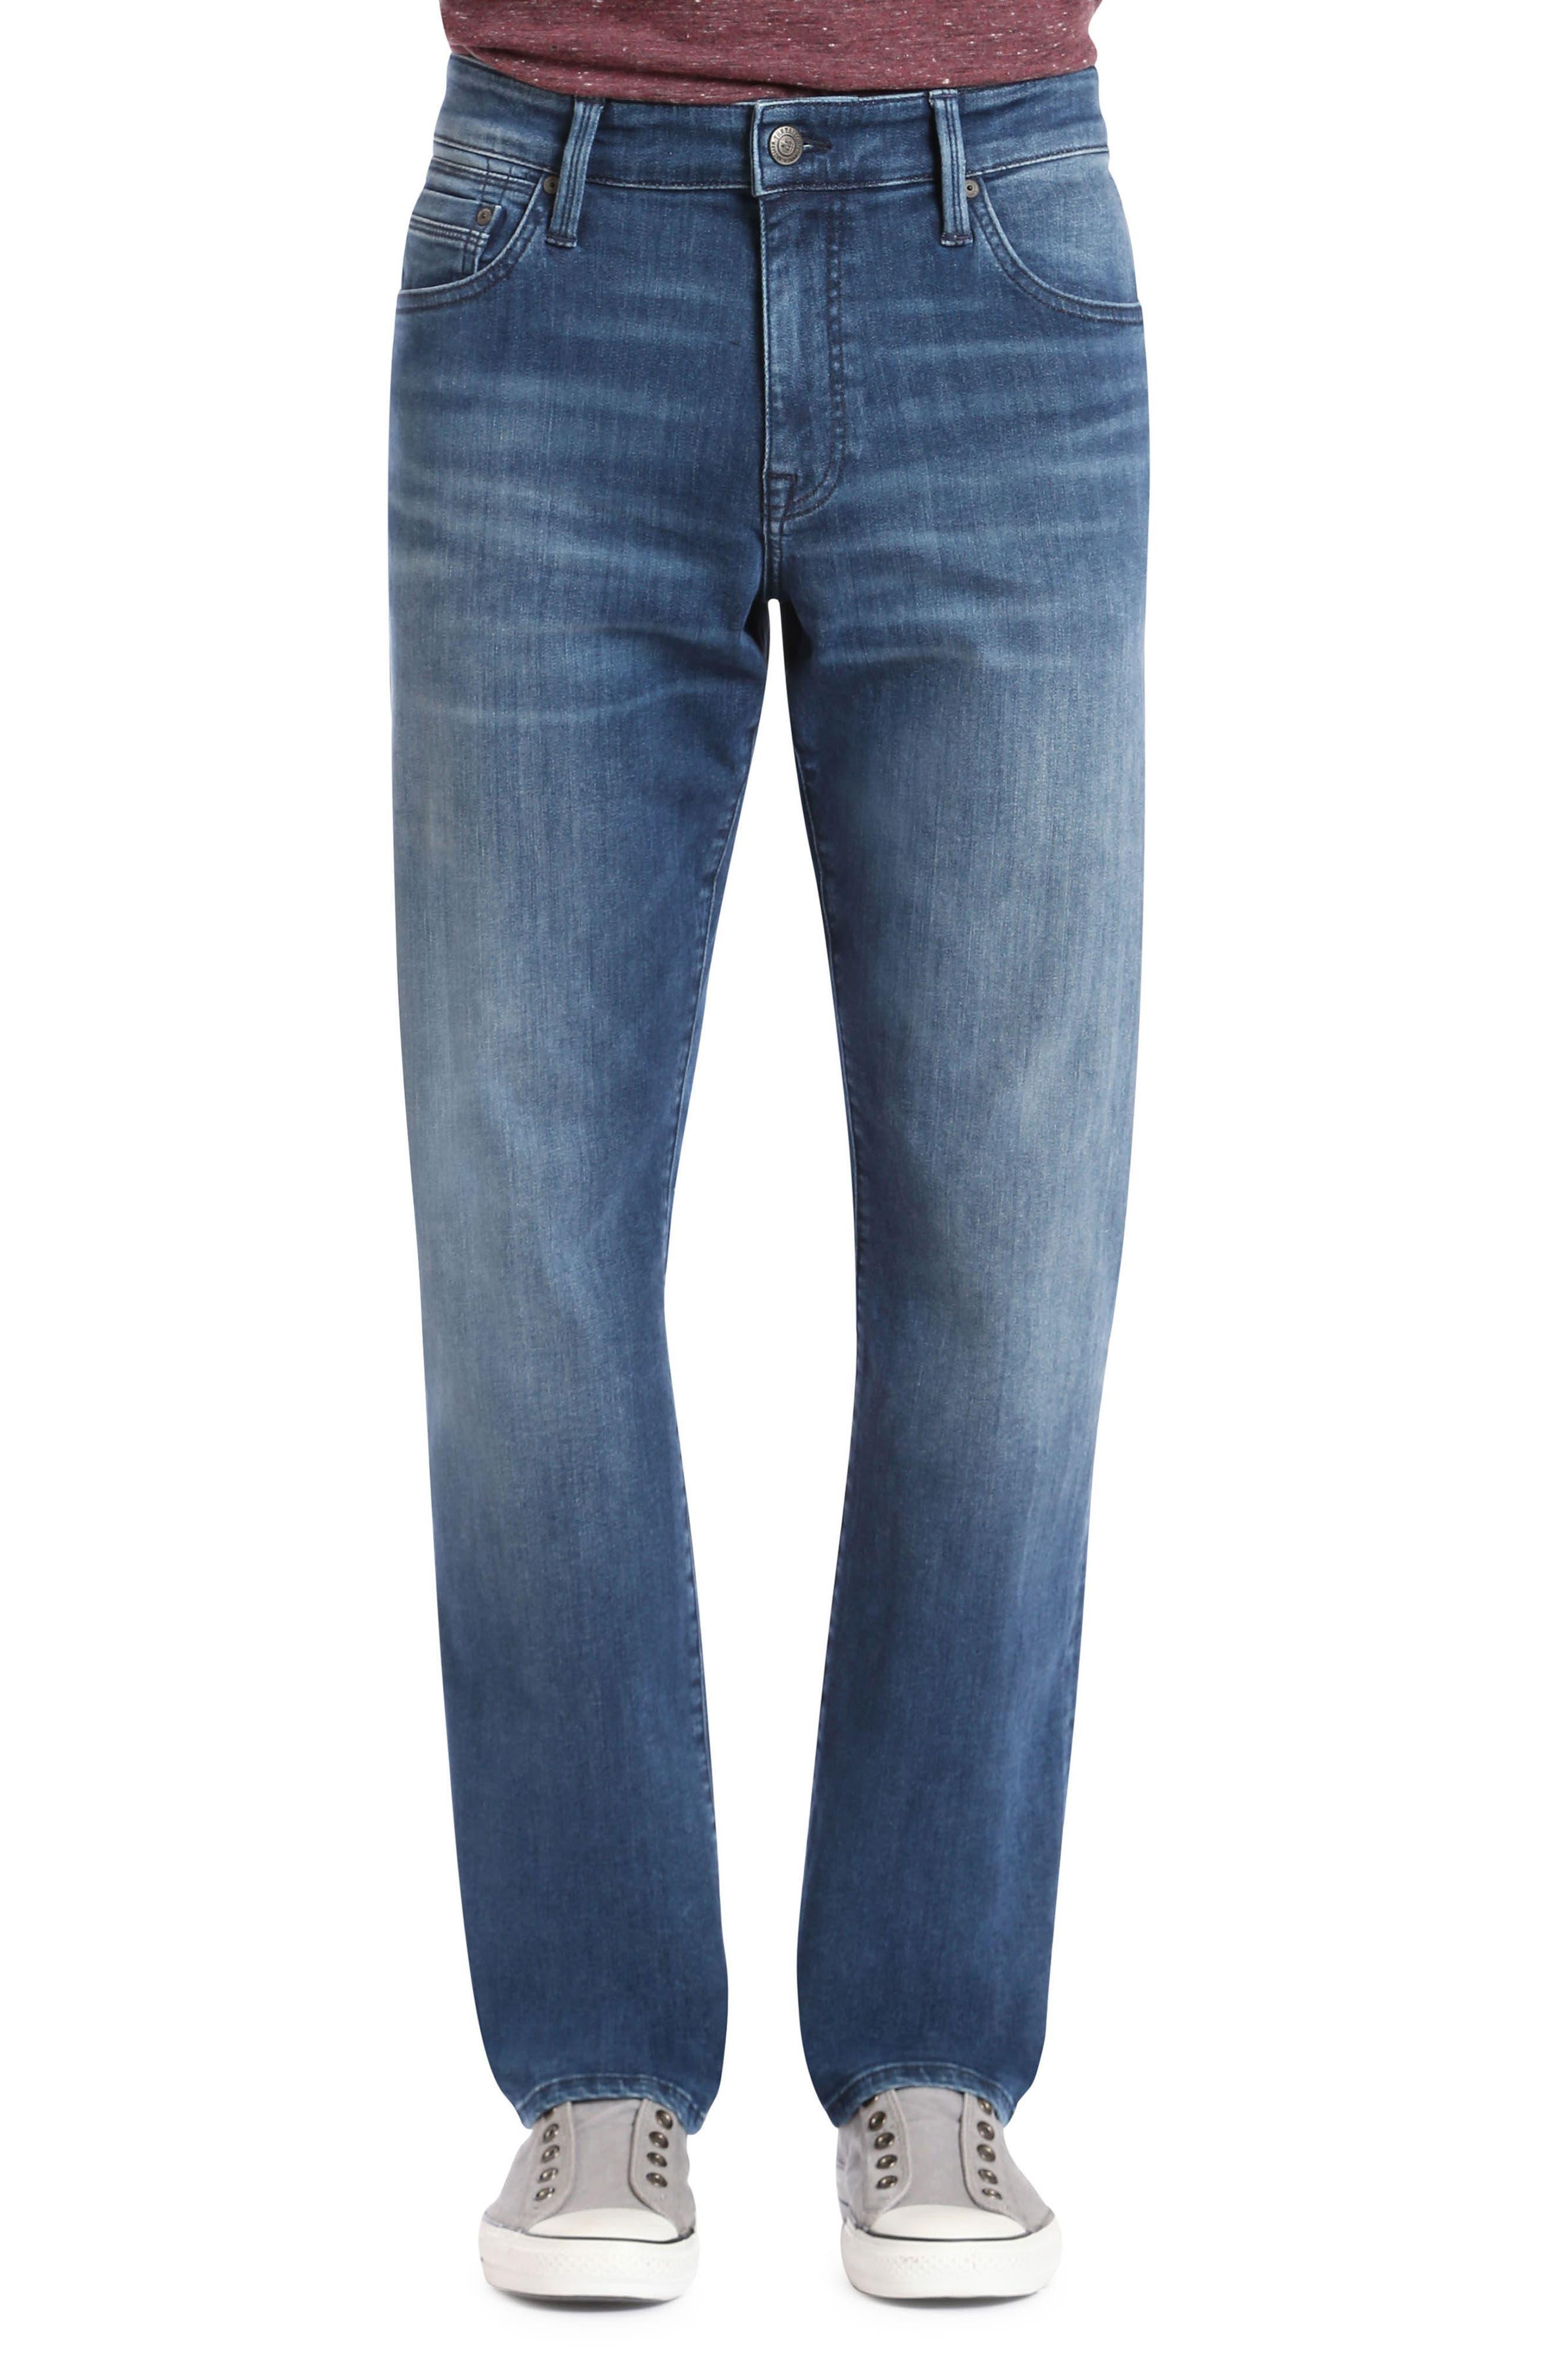 Myles Straight Leg Jeans,                         Main,                         color, Mid Tonal Williamsburg